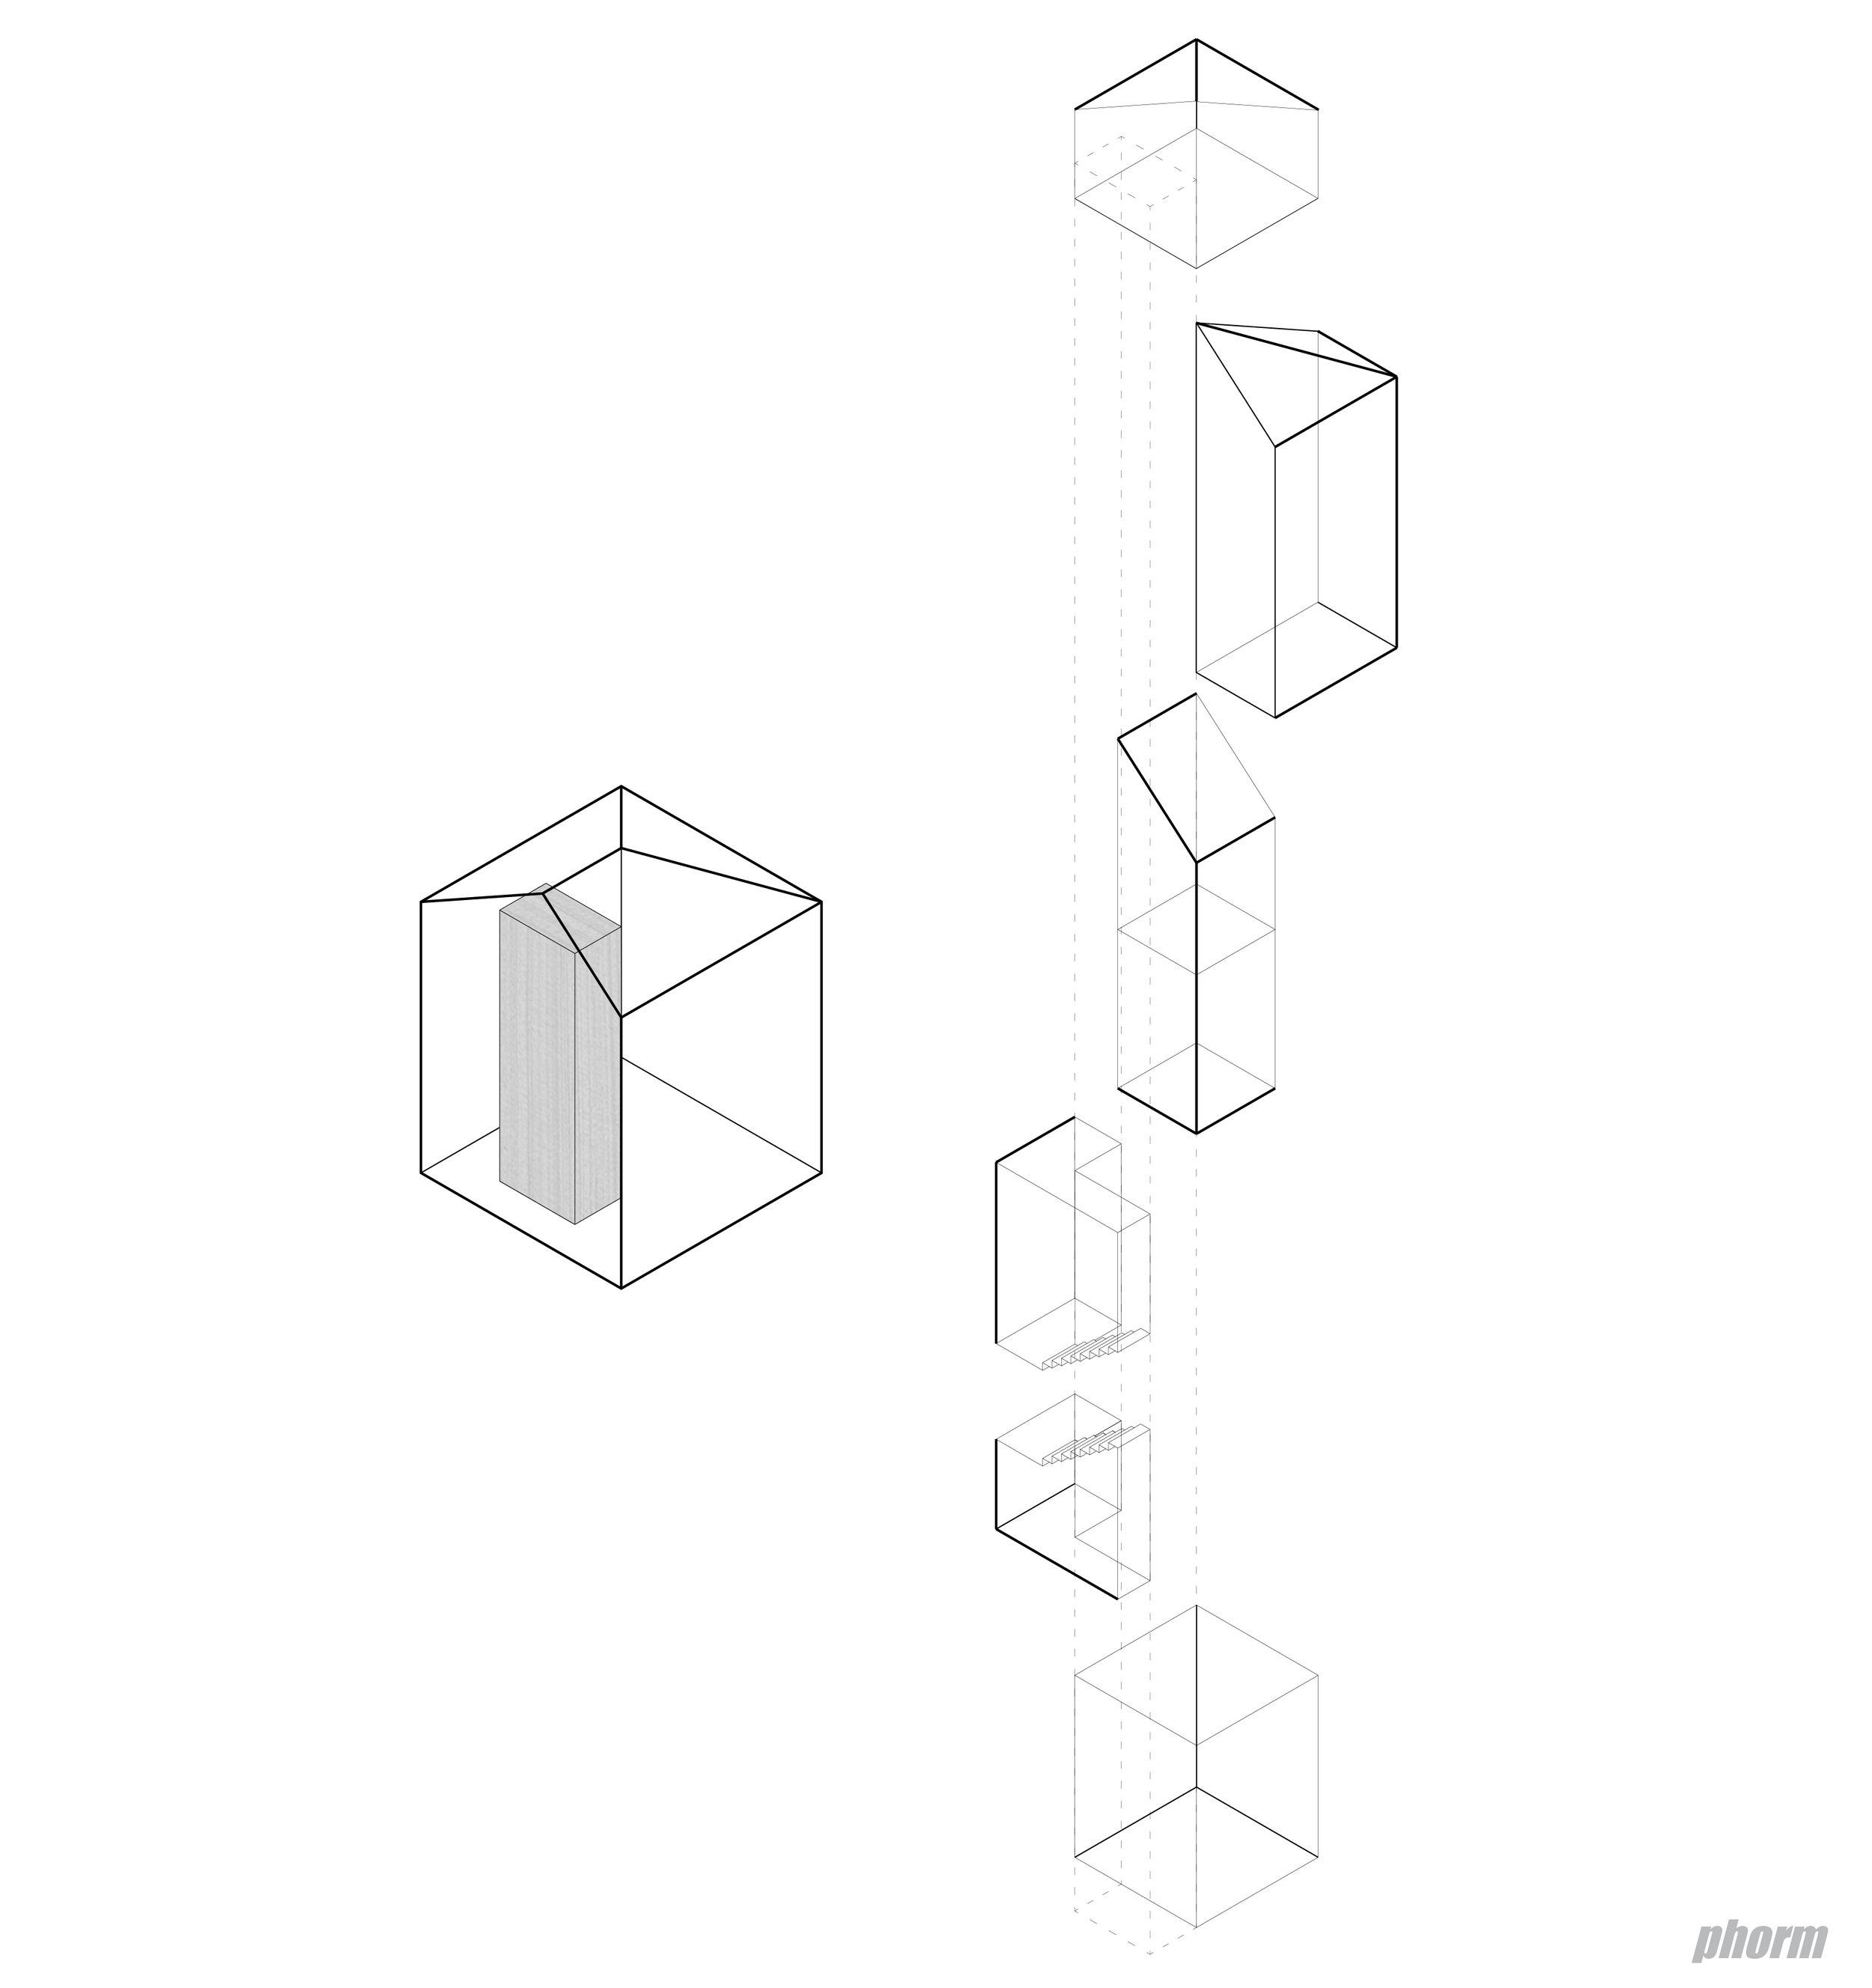 16.08_Compositional Diagram website-01.jpg